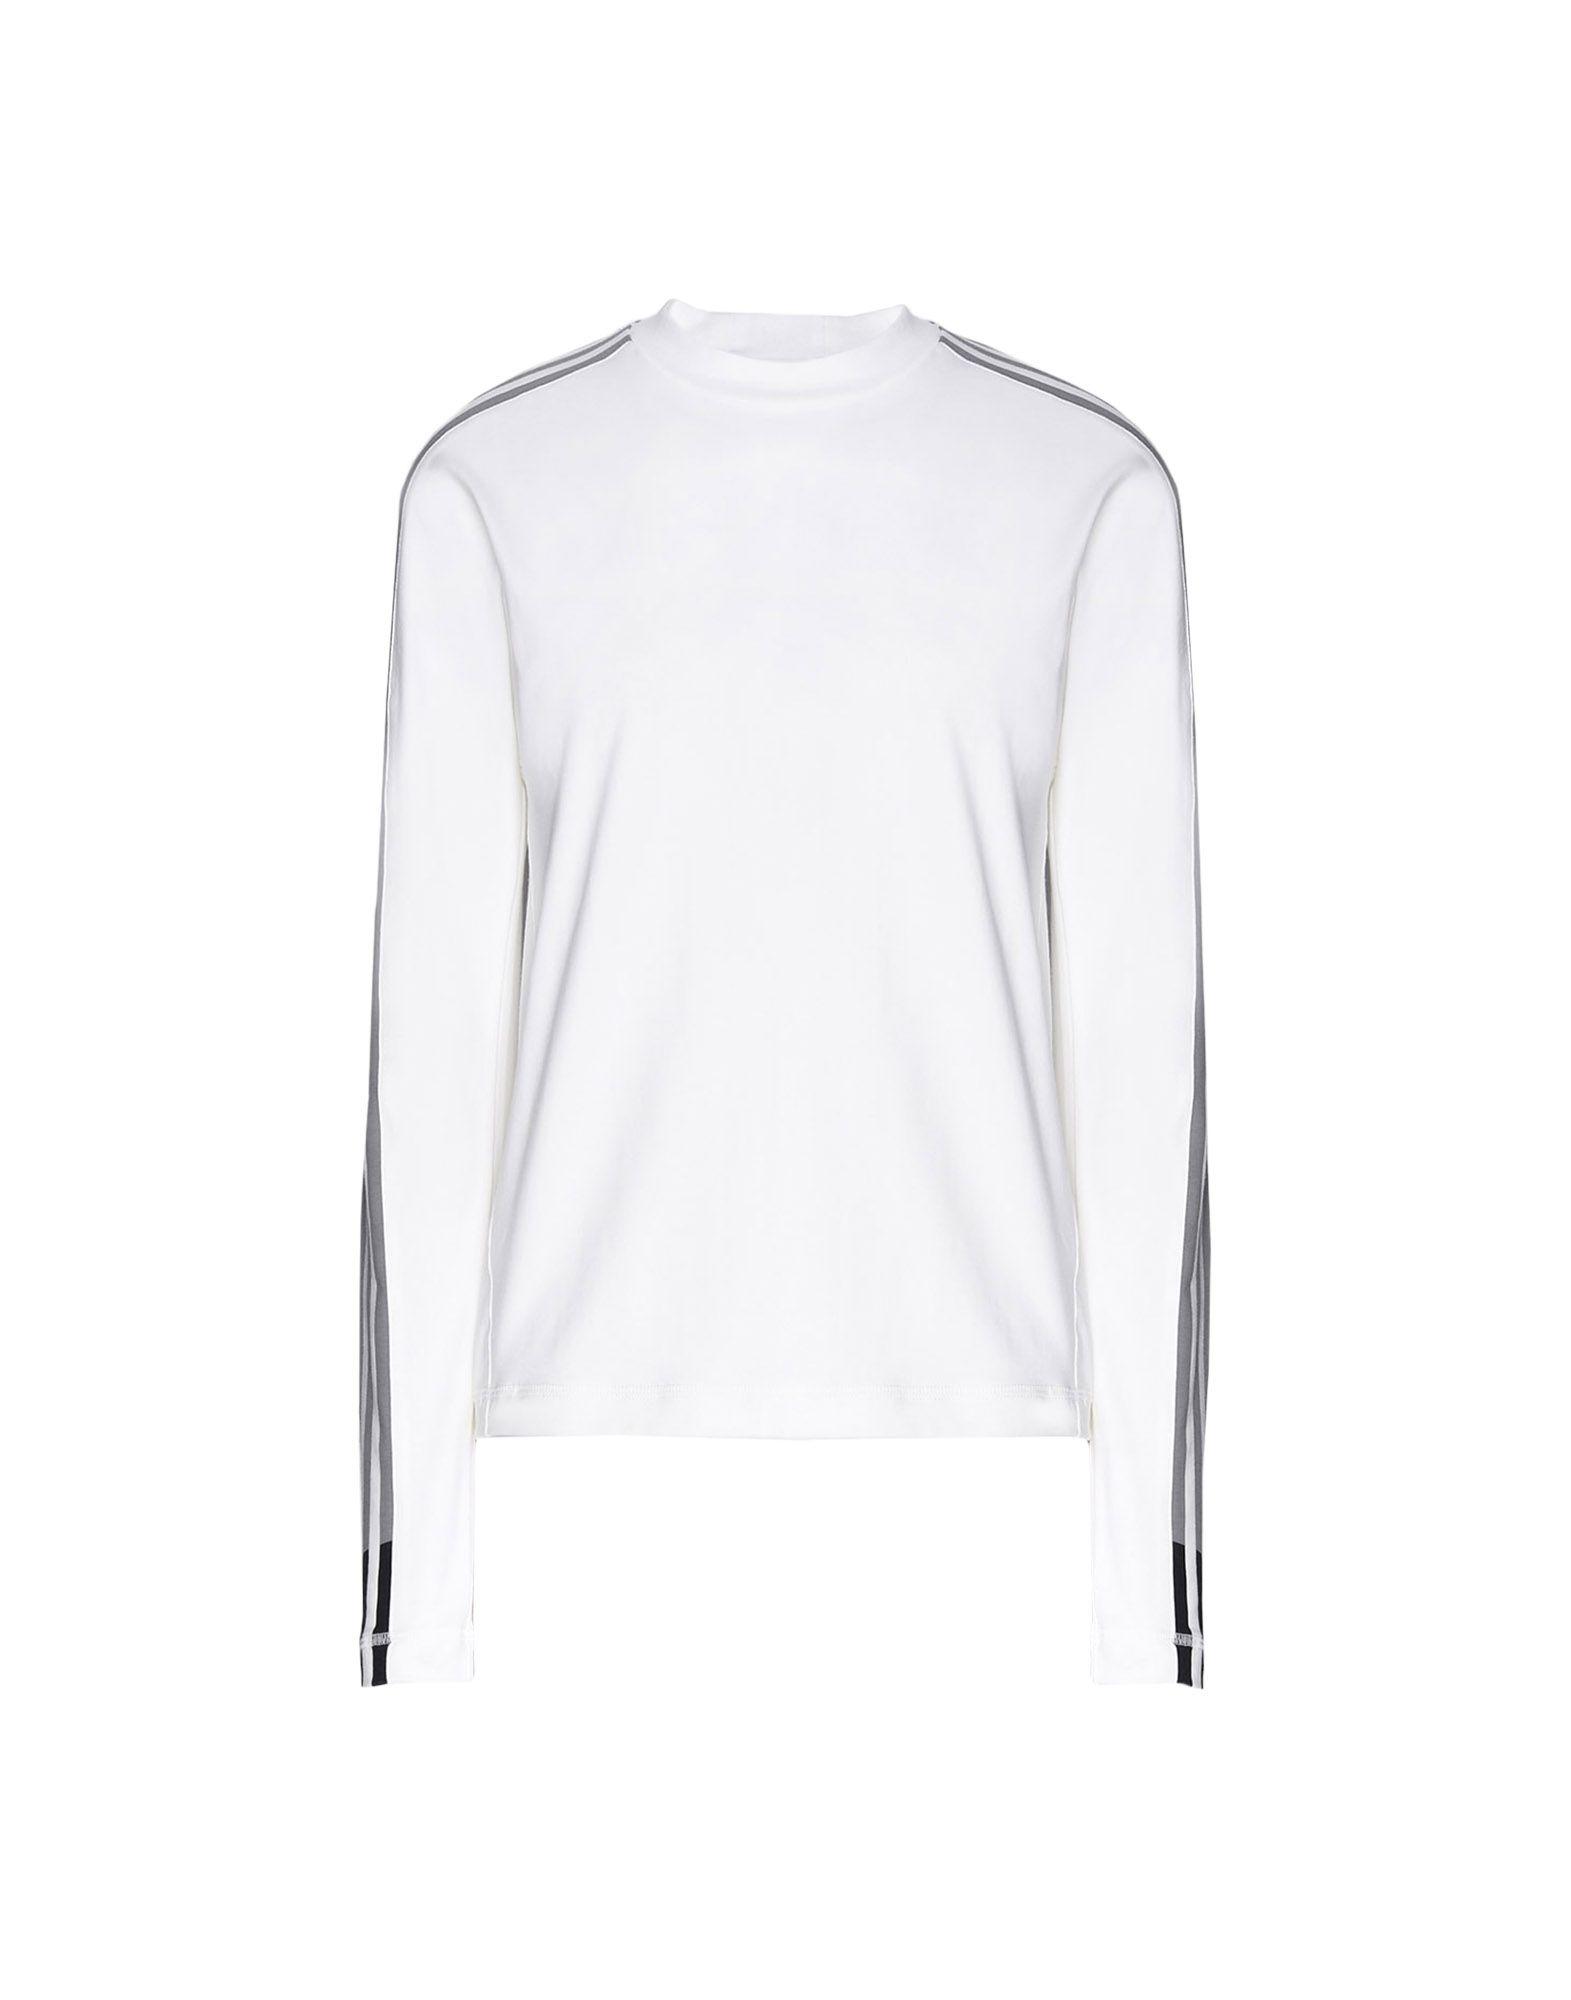 Y-3 Y-3 3-Stripes Tee Long sleeve t-shirt Woman f